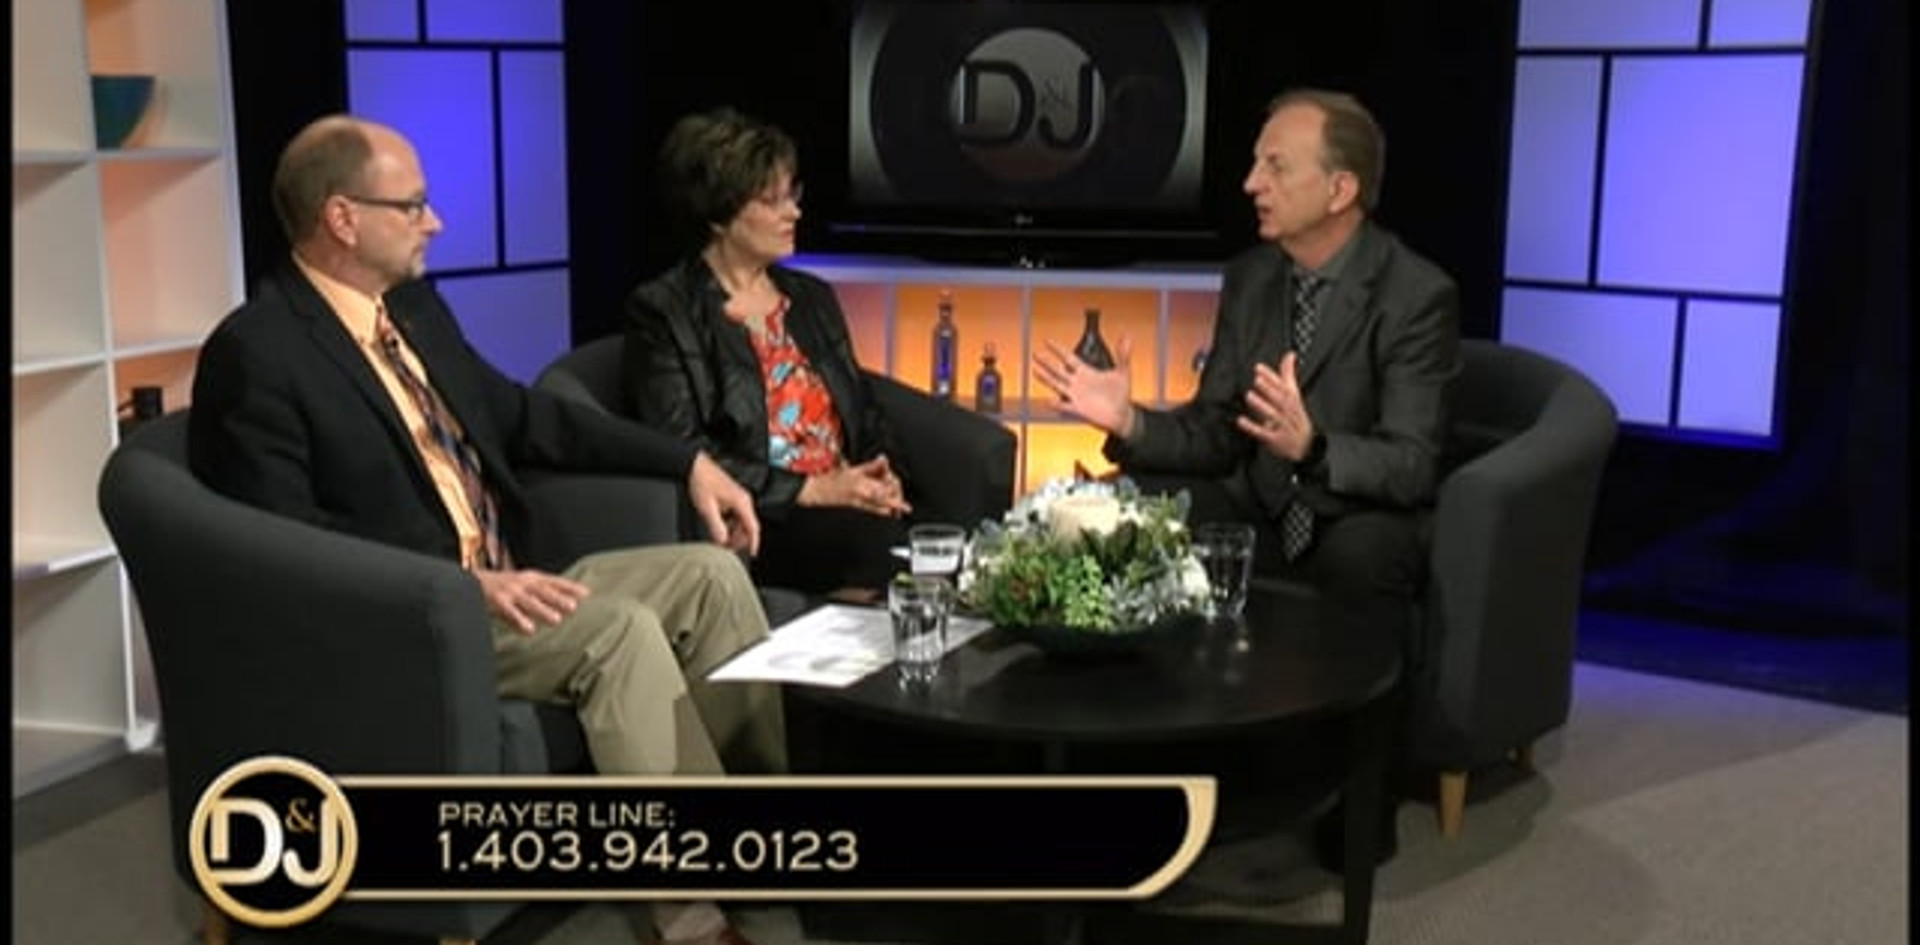 LIFELINE TODAY | Season 3, Episode 86 | Len Zoeteman